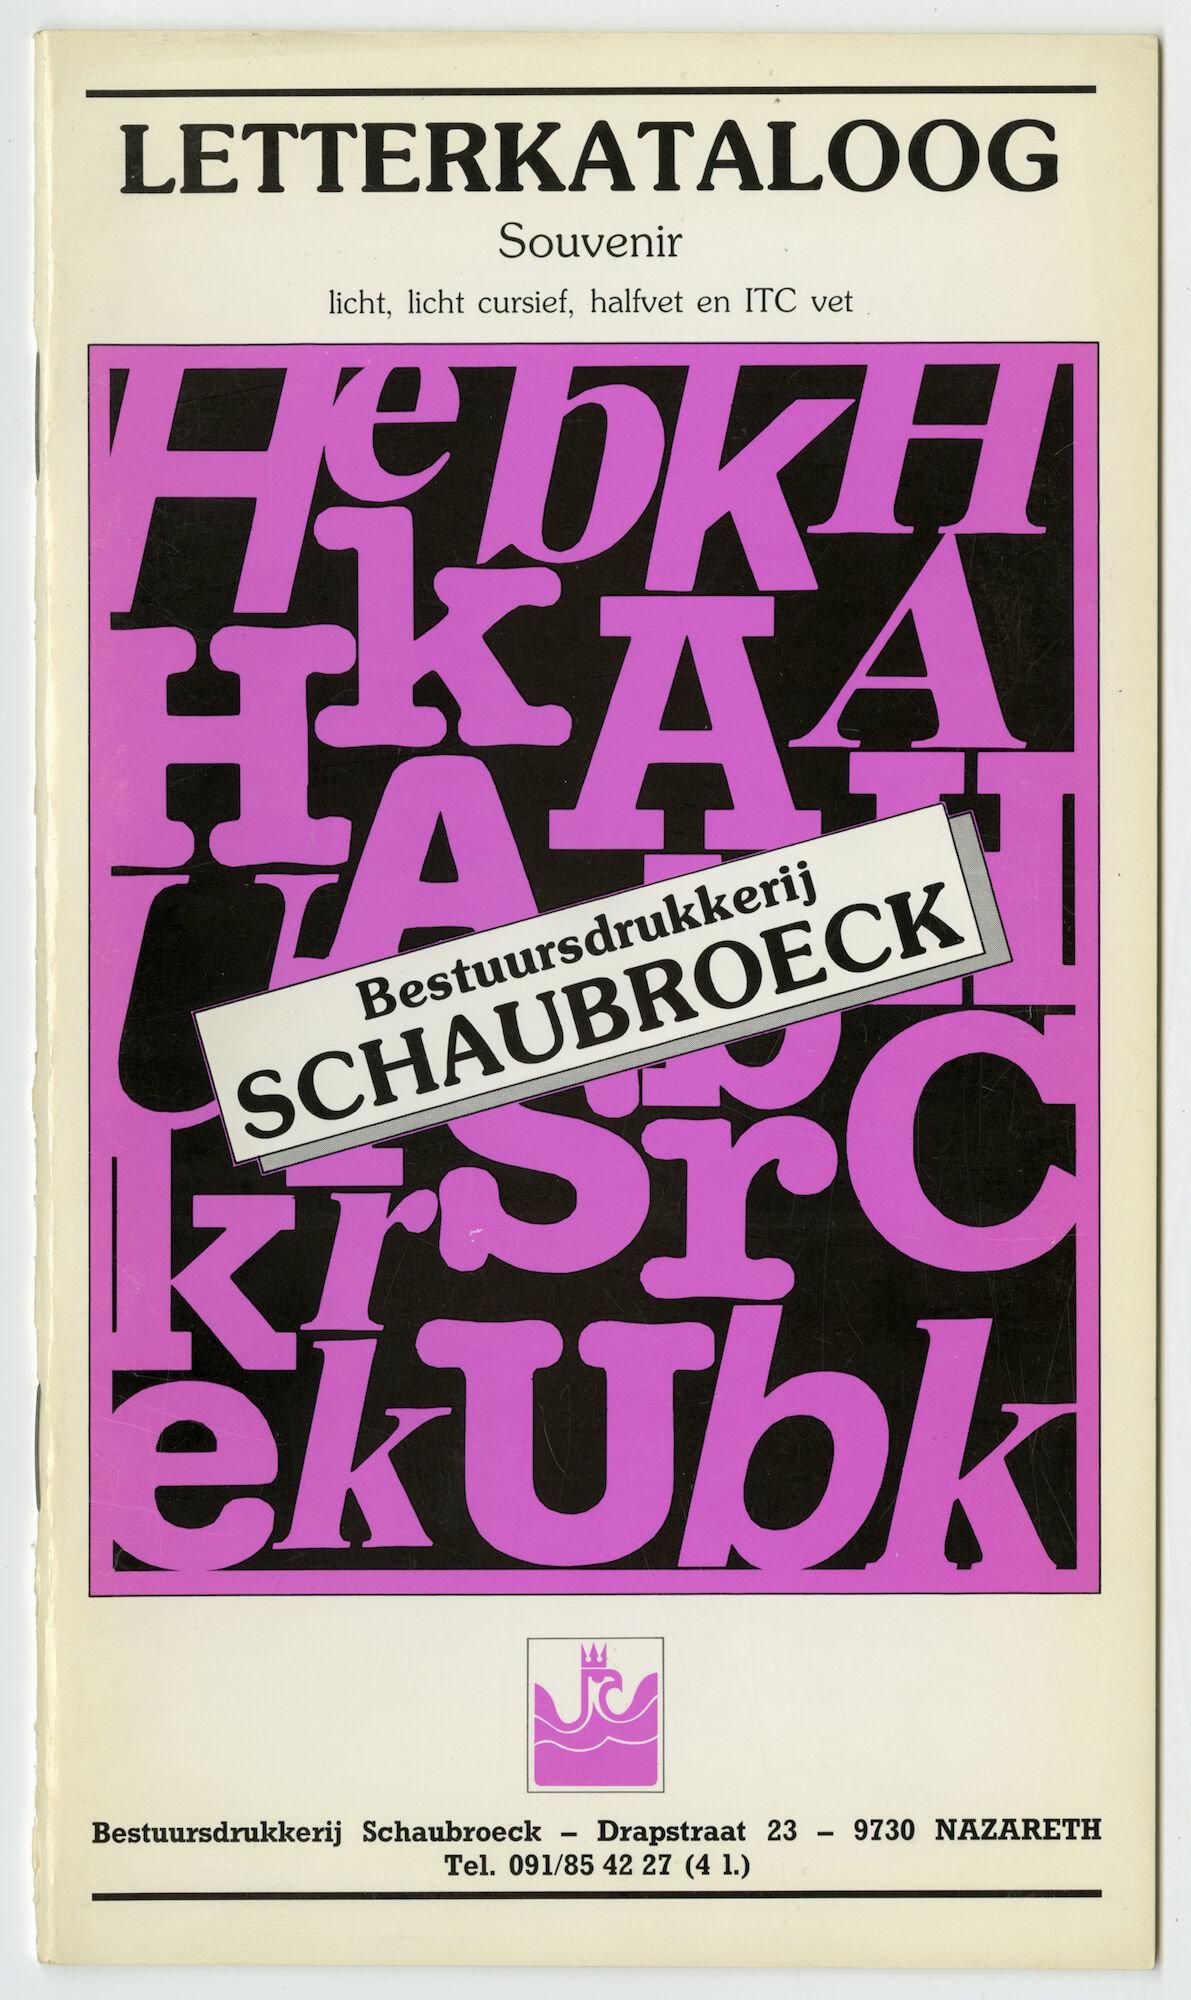 Letterproef met het lettertype Souvenir